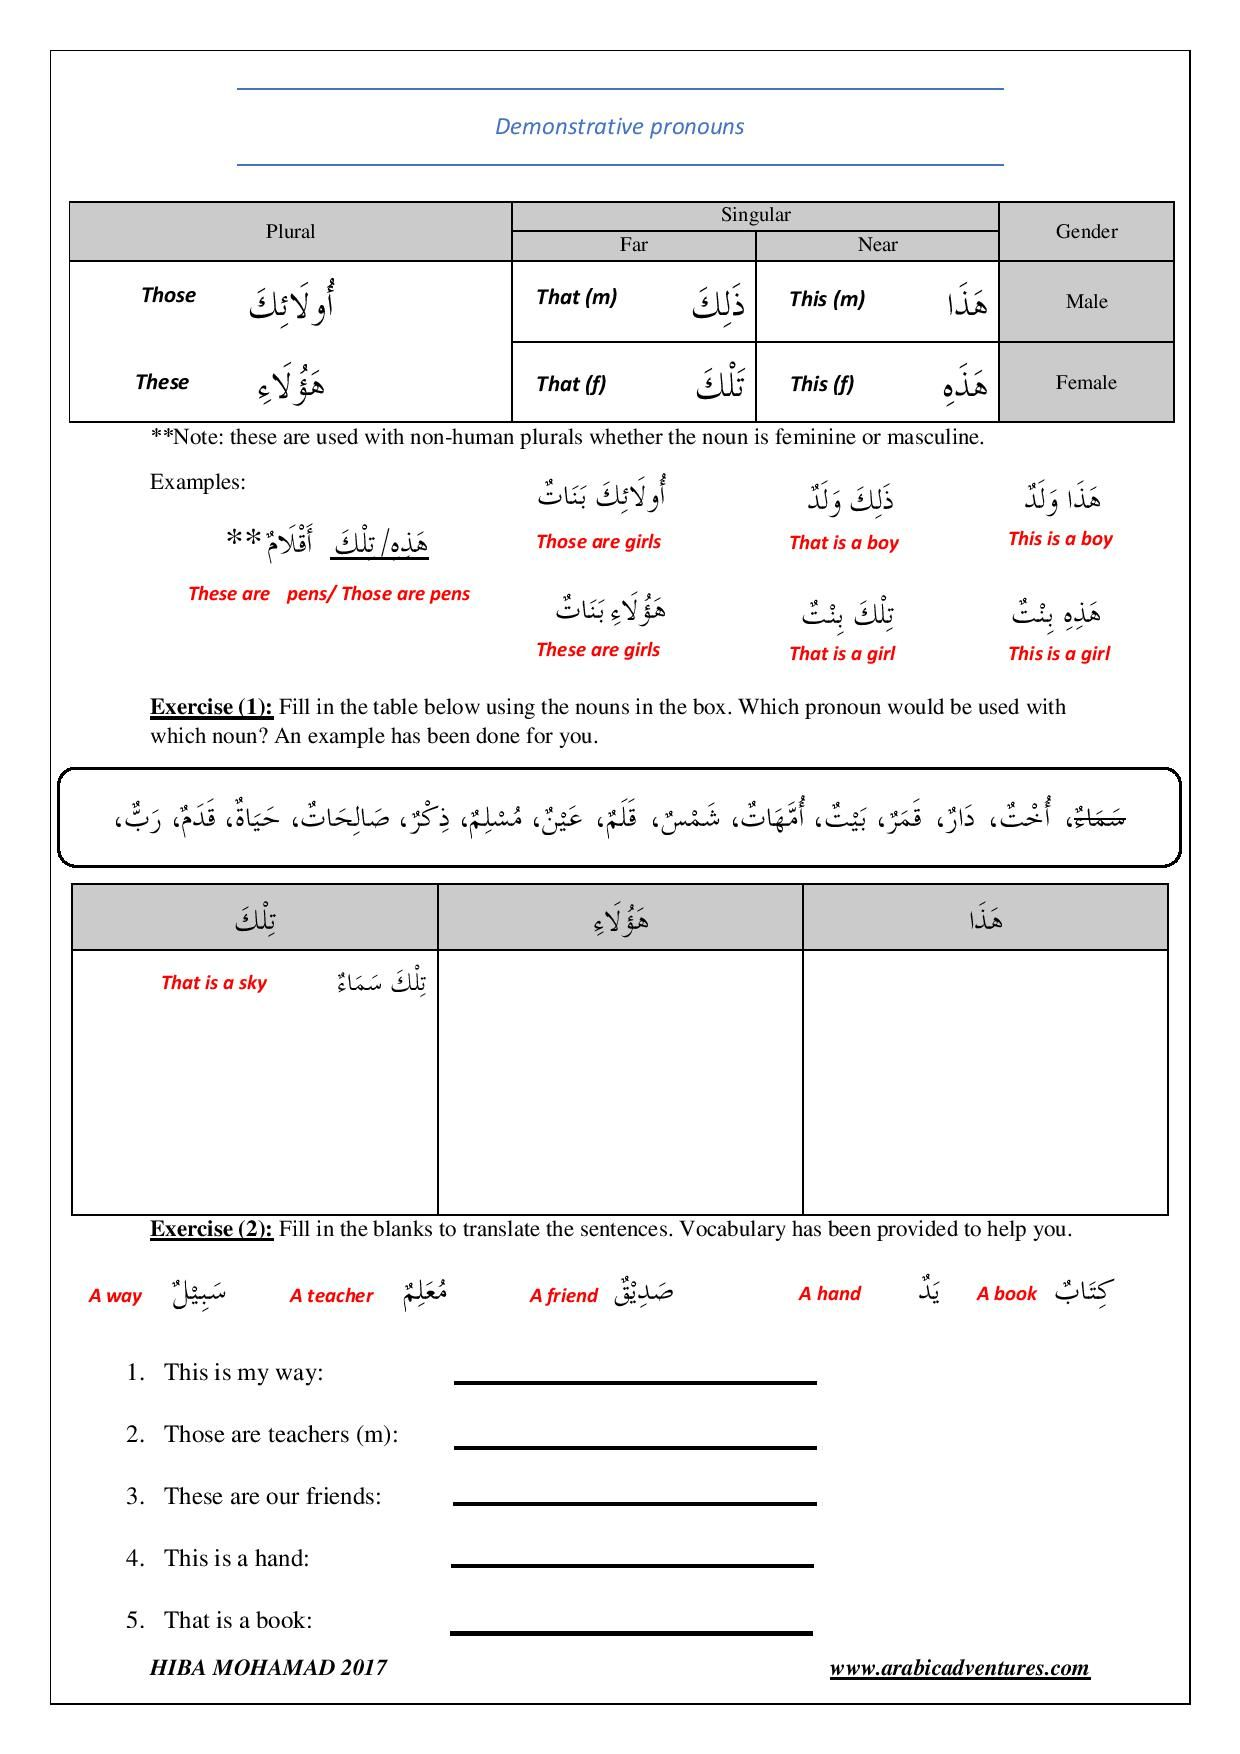 small resolution of Demonstrative pronouns worksheet www.arabicadventures.com   Demonstrative  pronouns